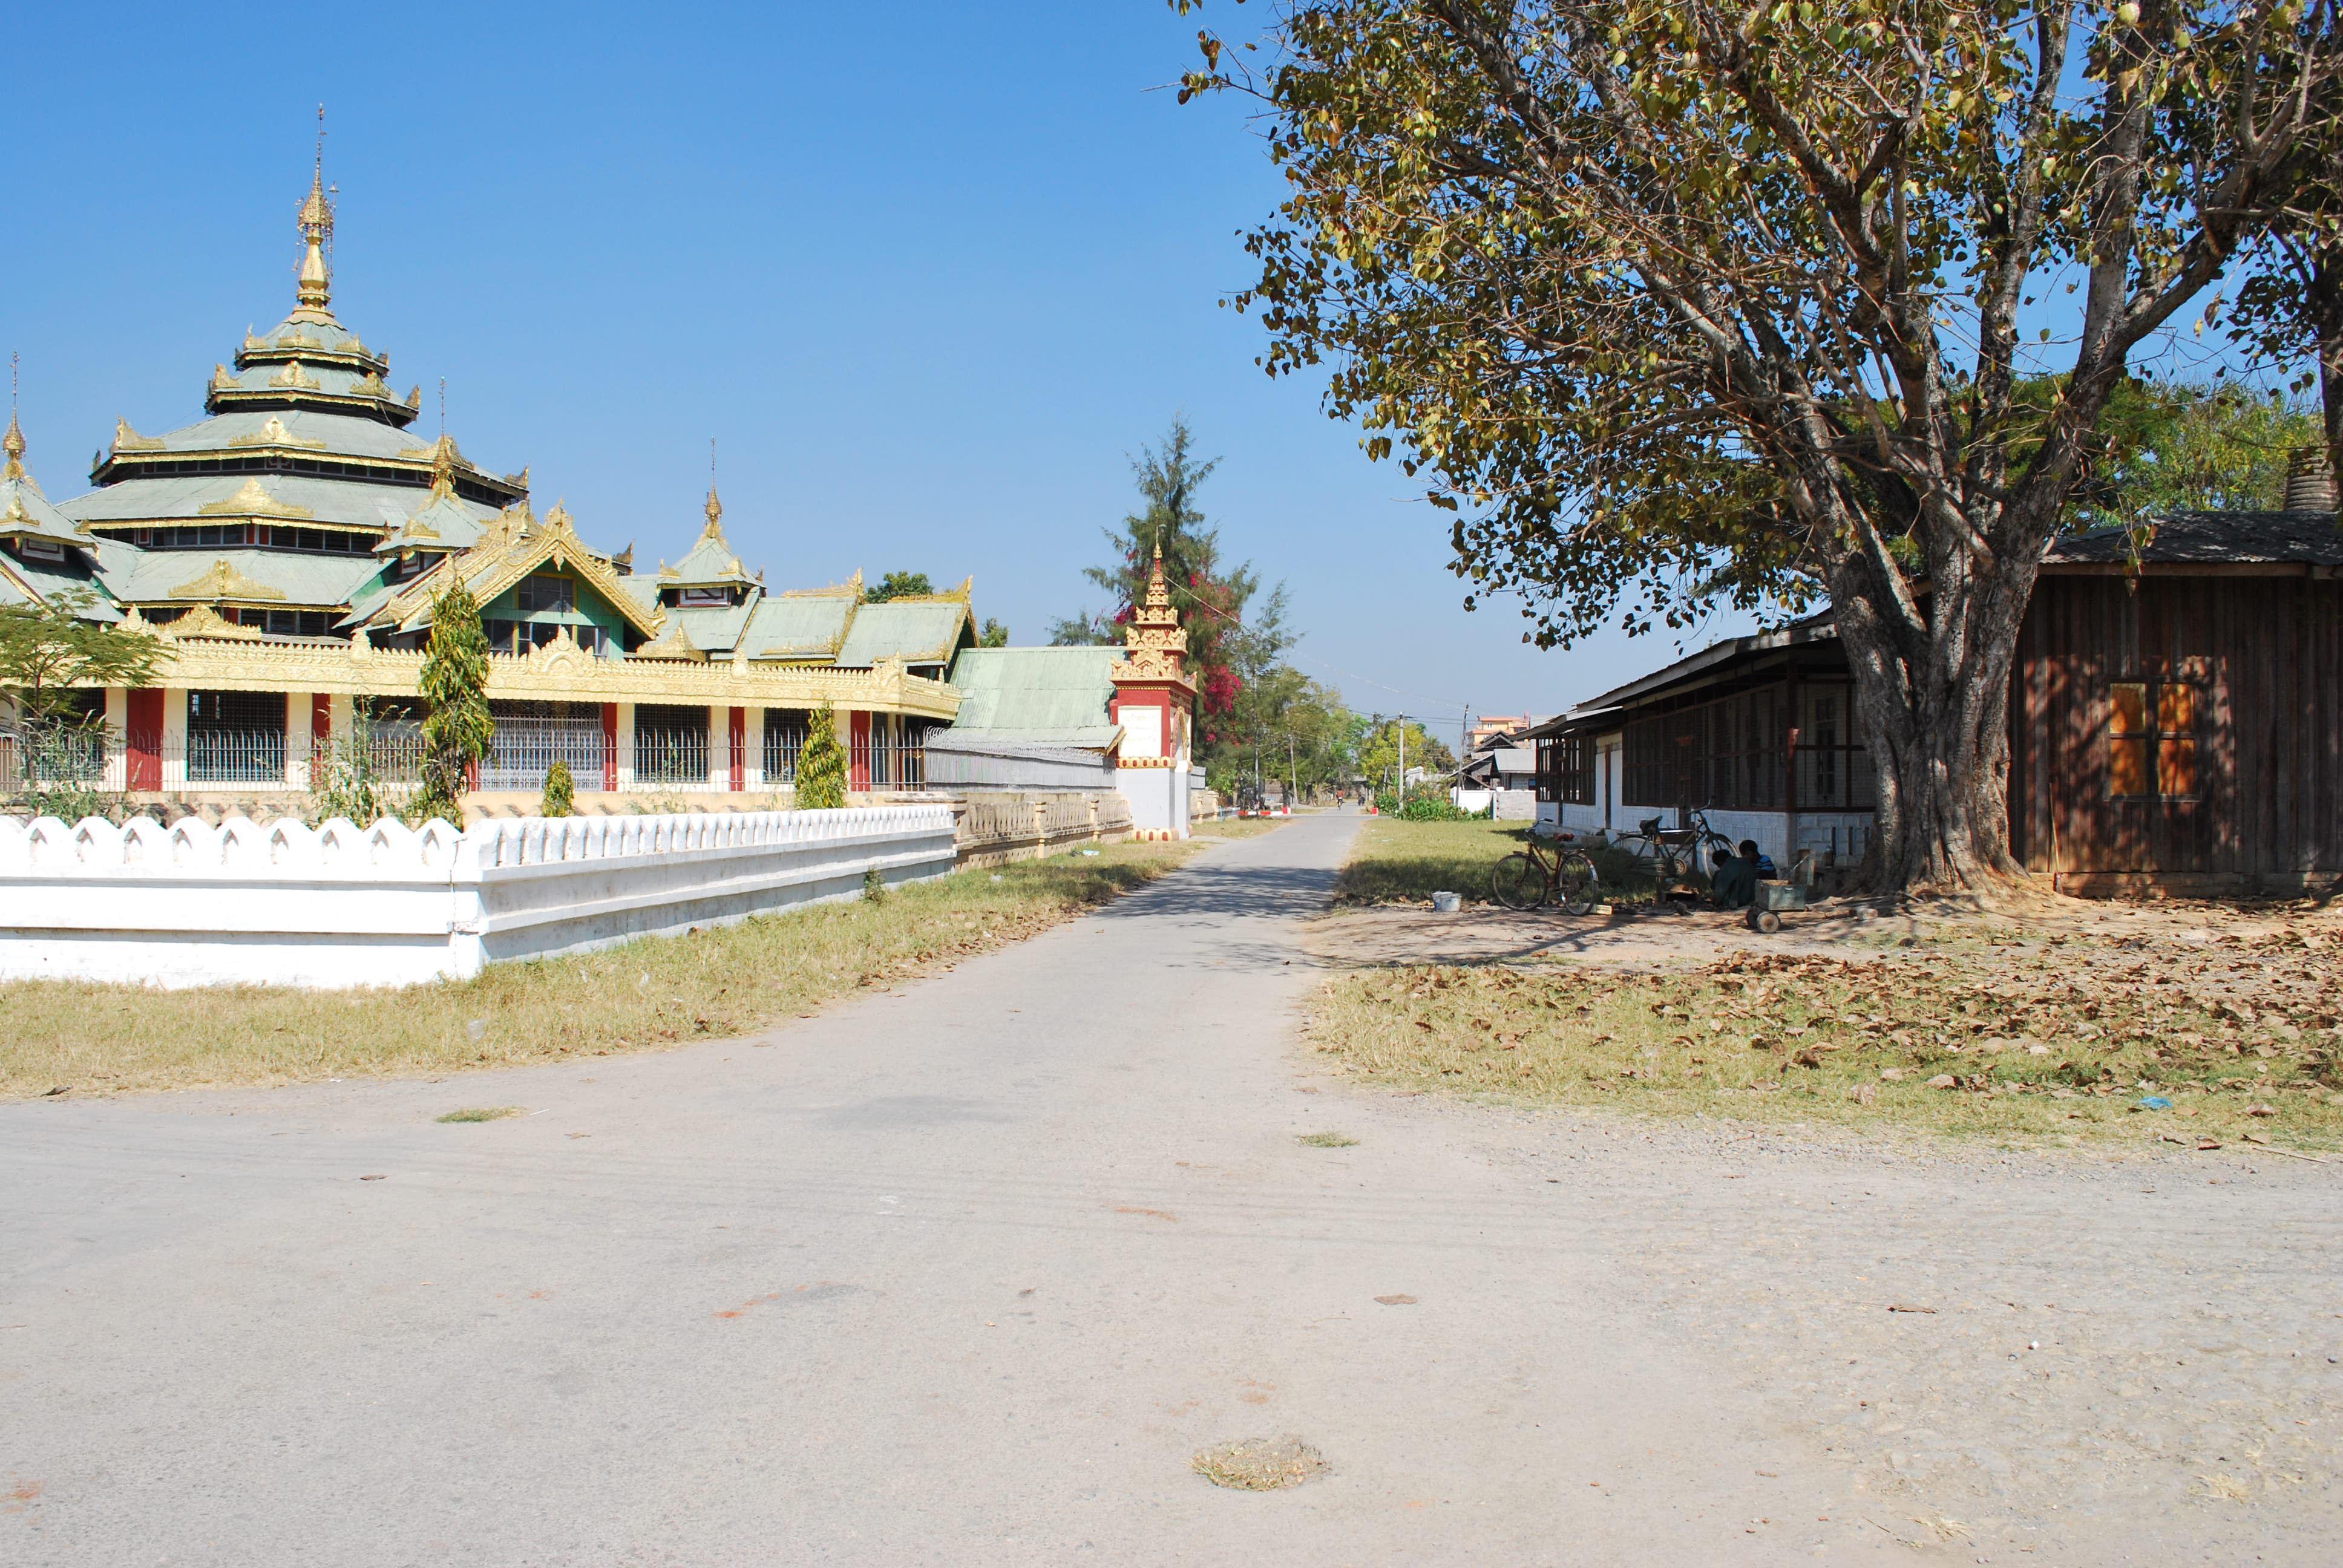 streets of nyaung shwe